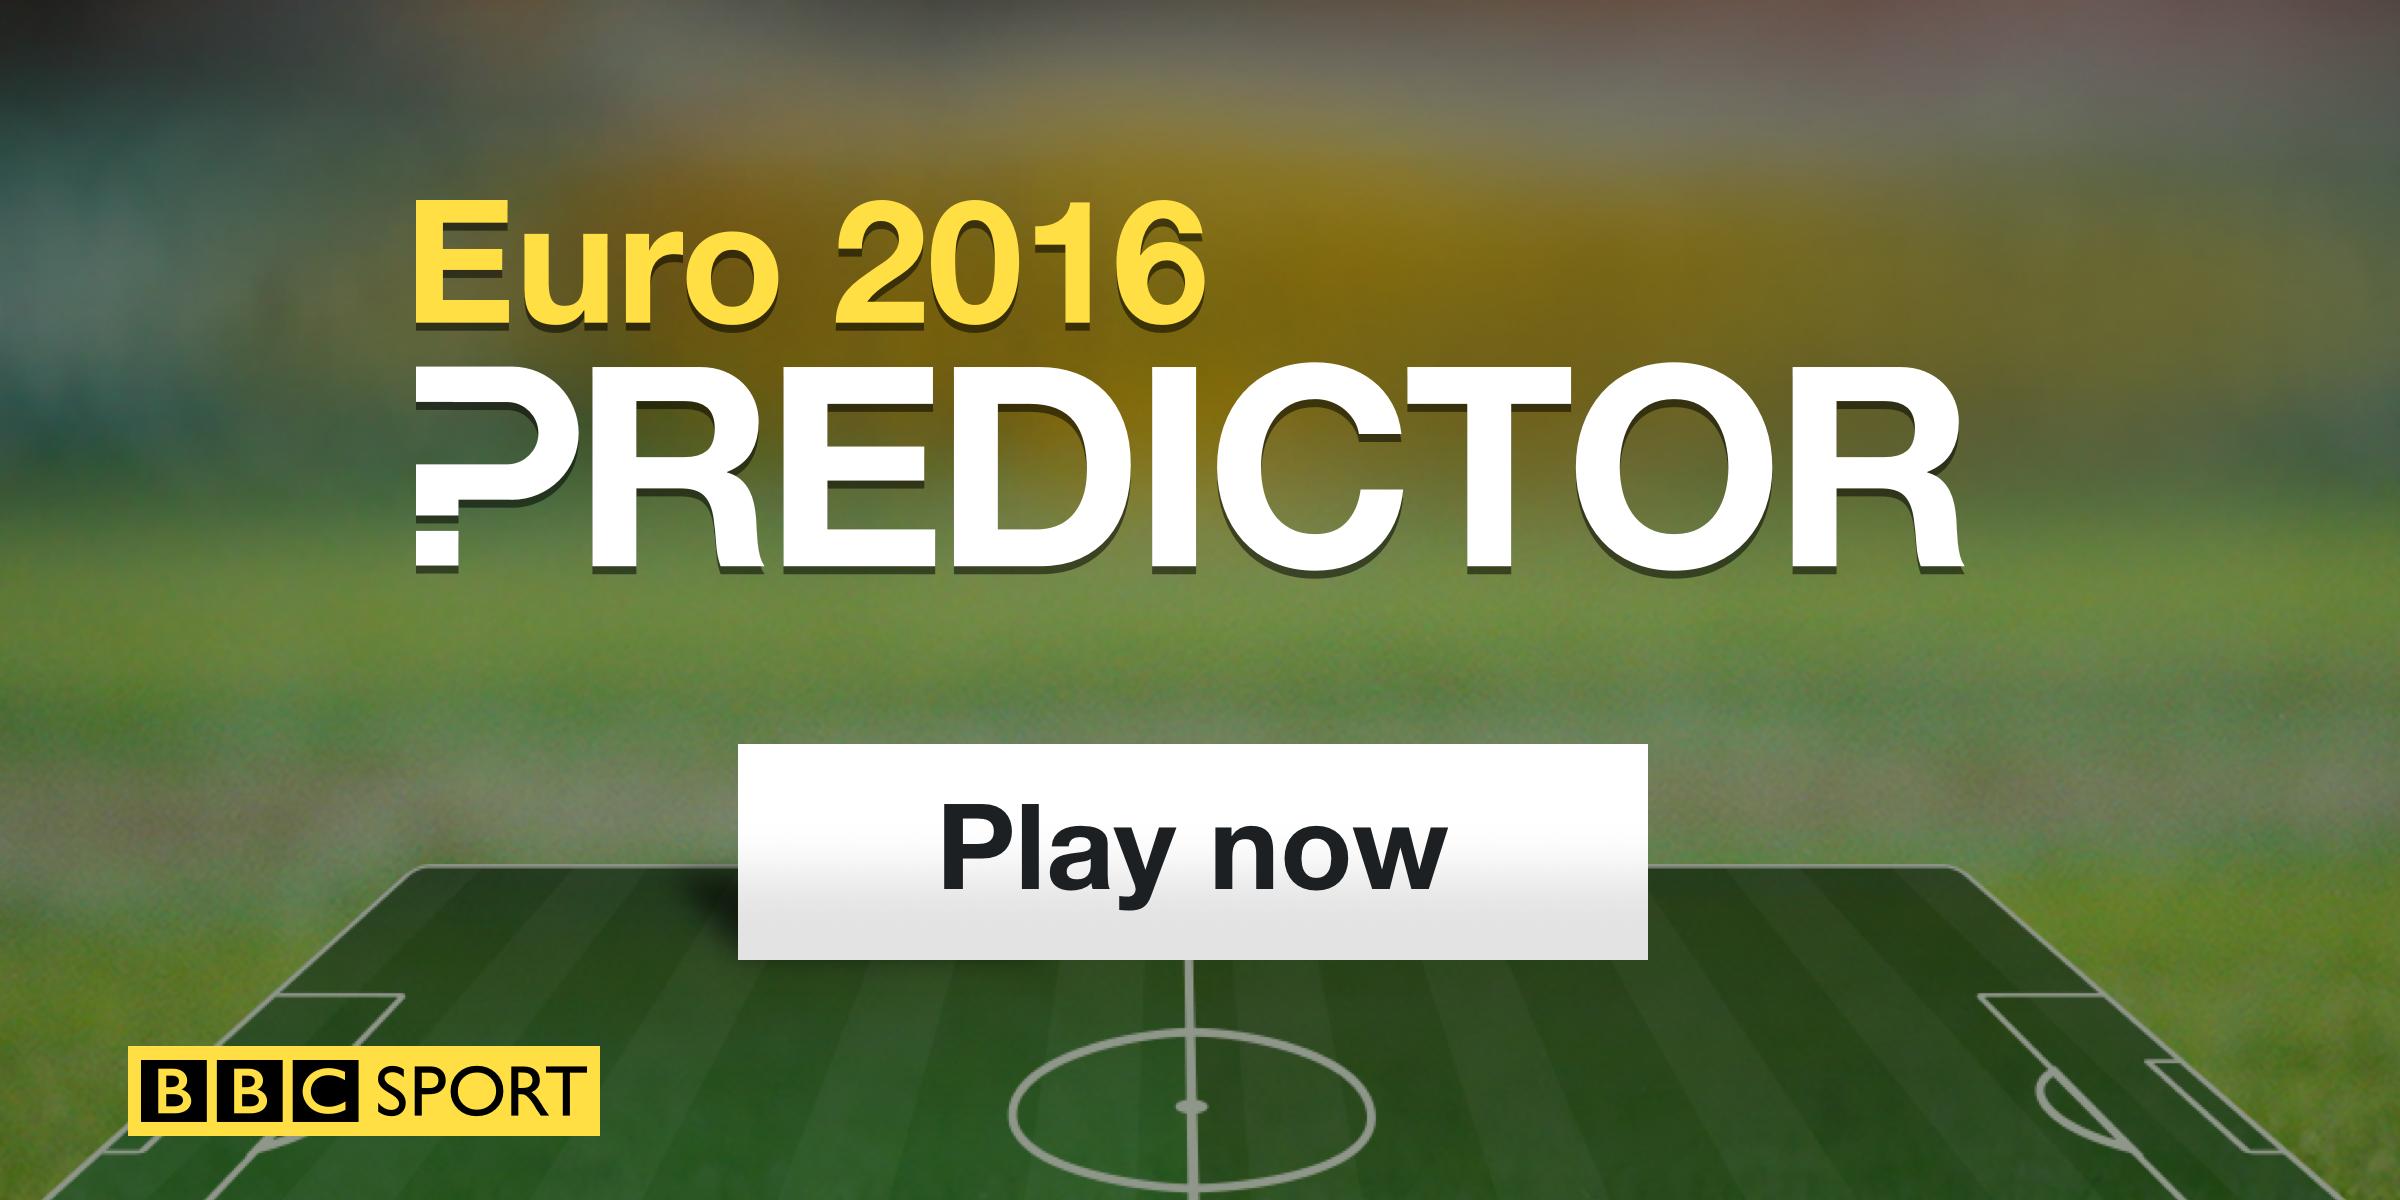 Predictor - Football - BBC Sport